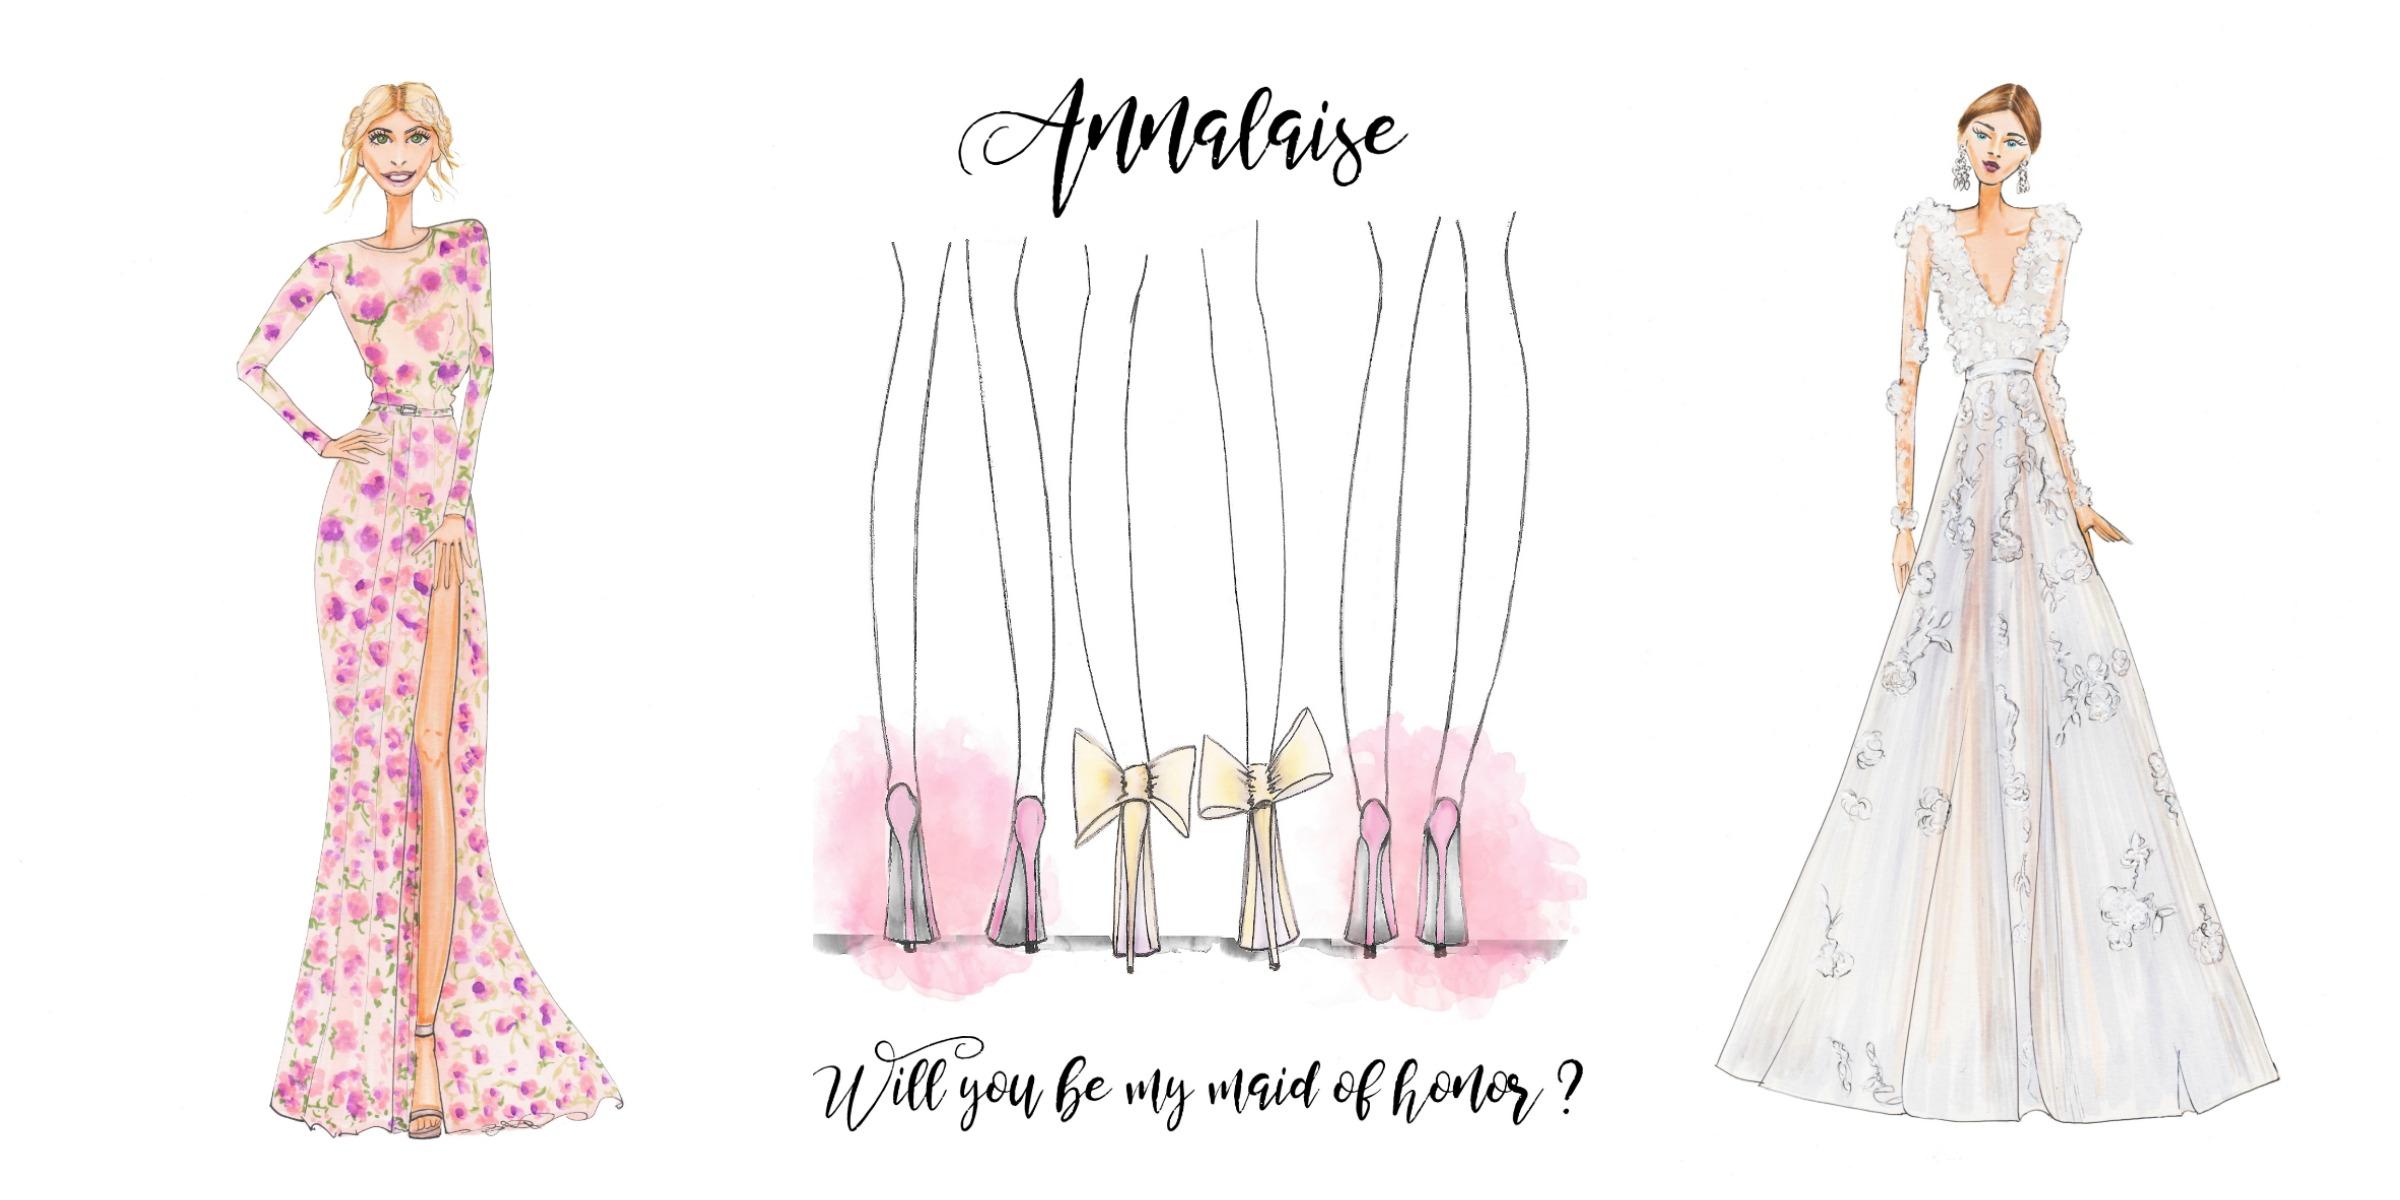 Supplier Spotlight: Custom Wedding + Lifestyle Art By Alison B. Illustration